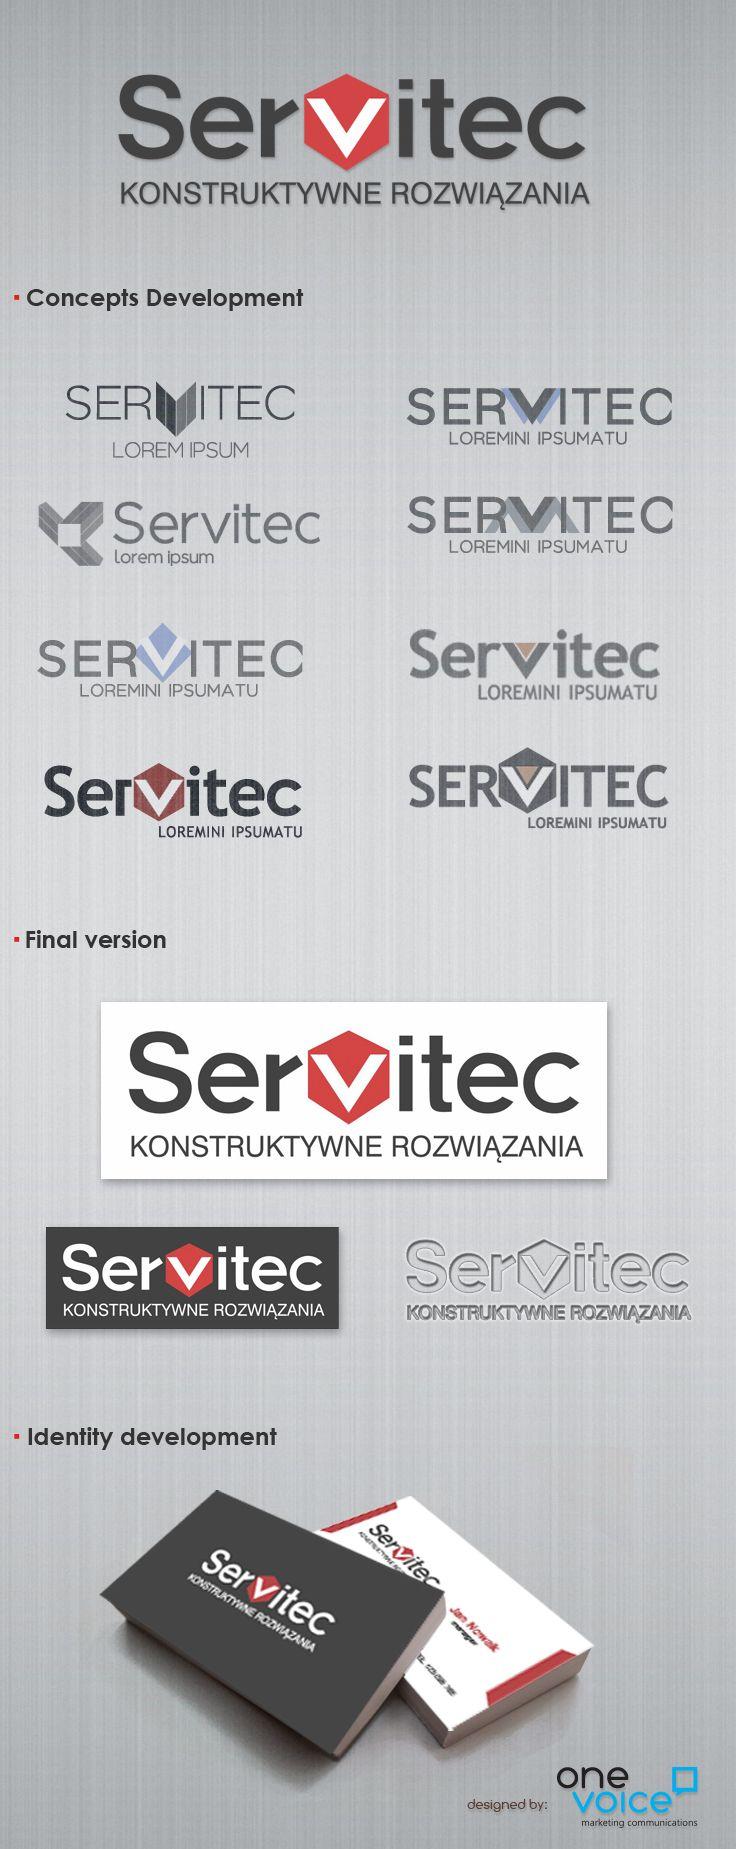 Servitec namind and logo design